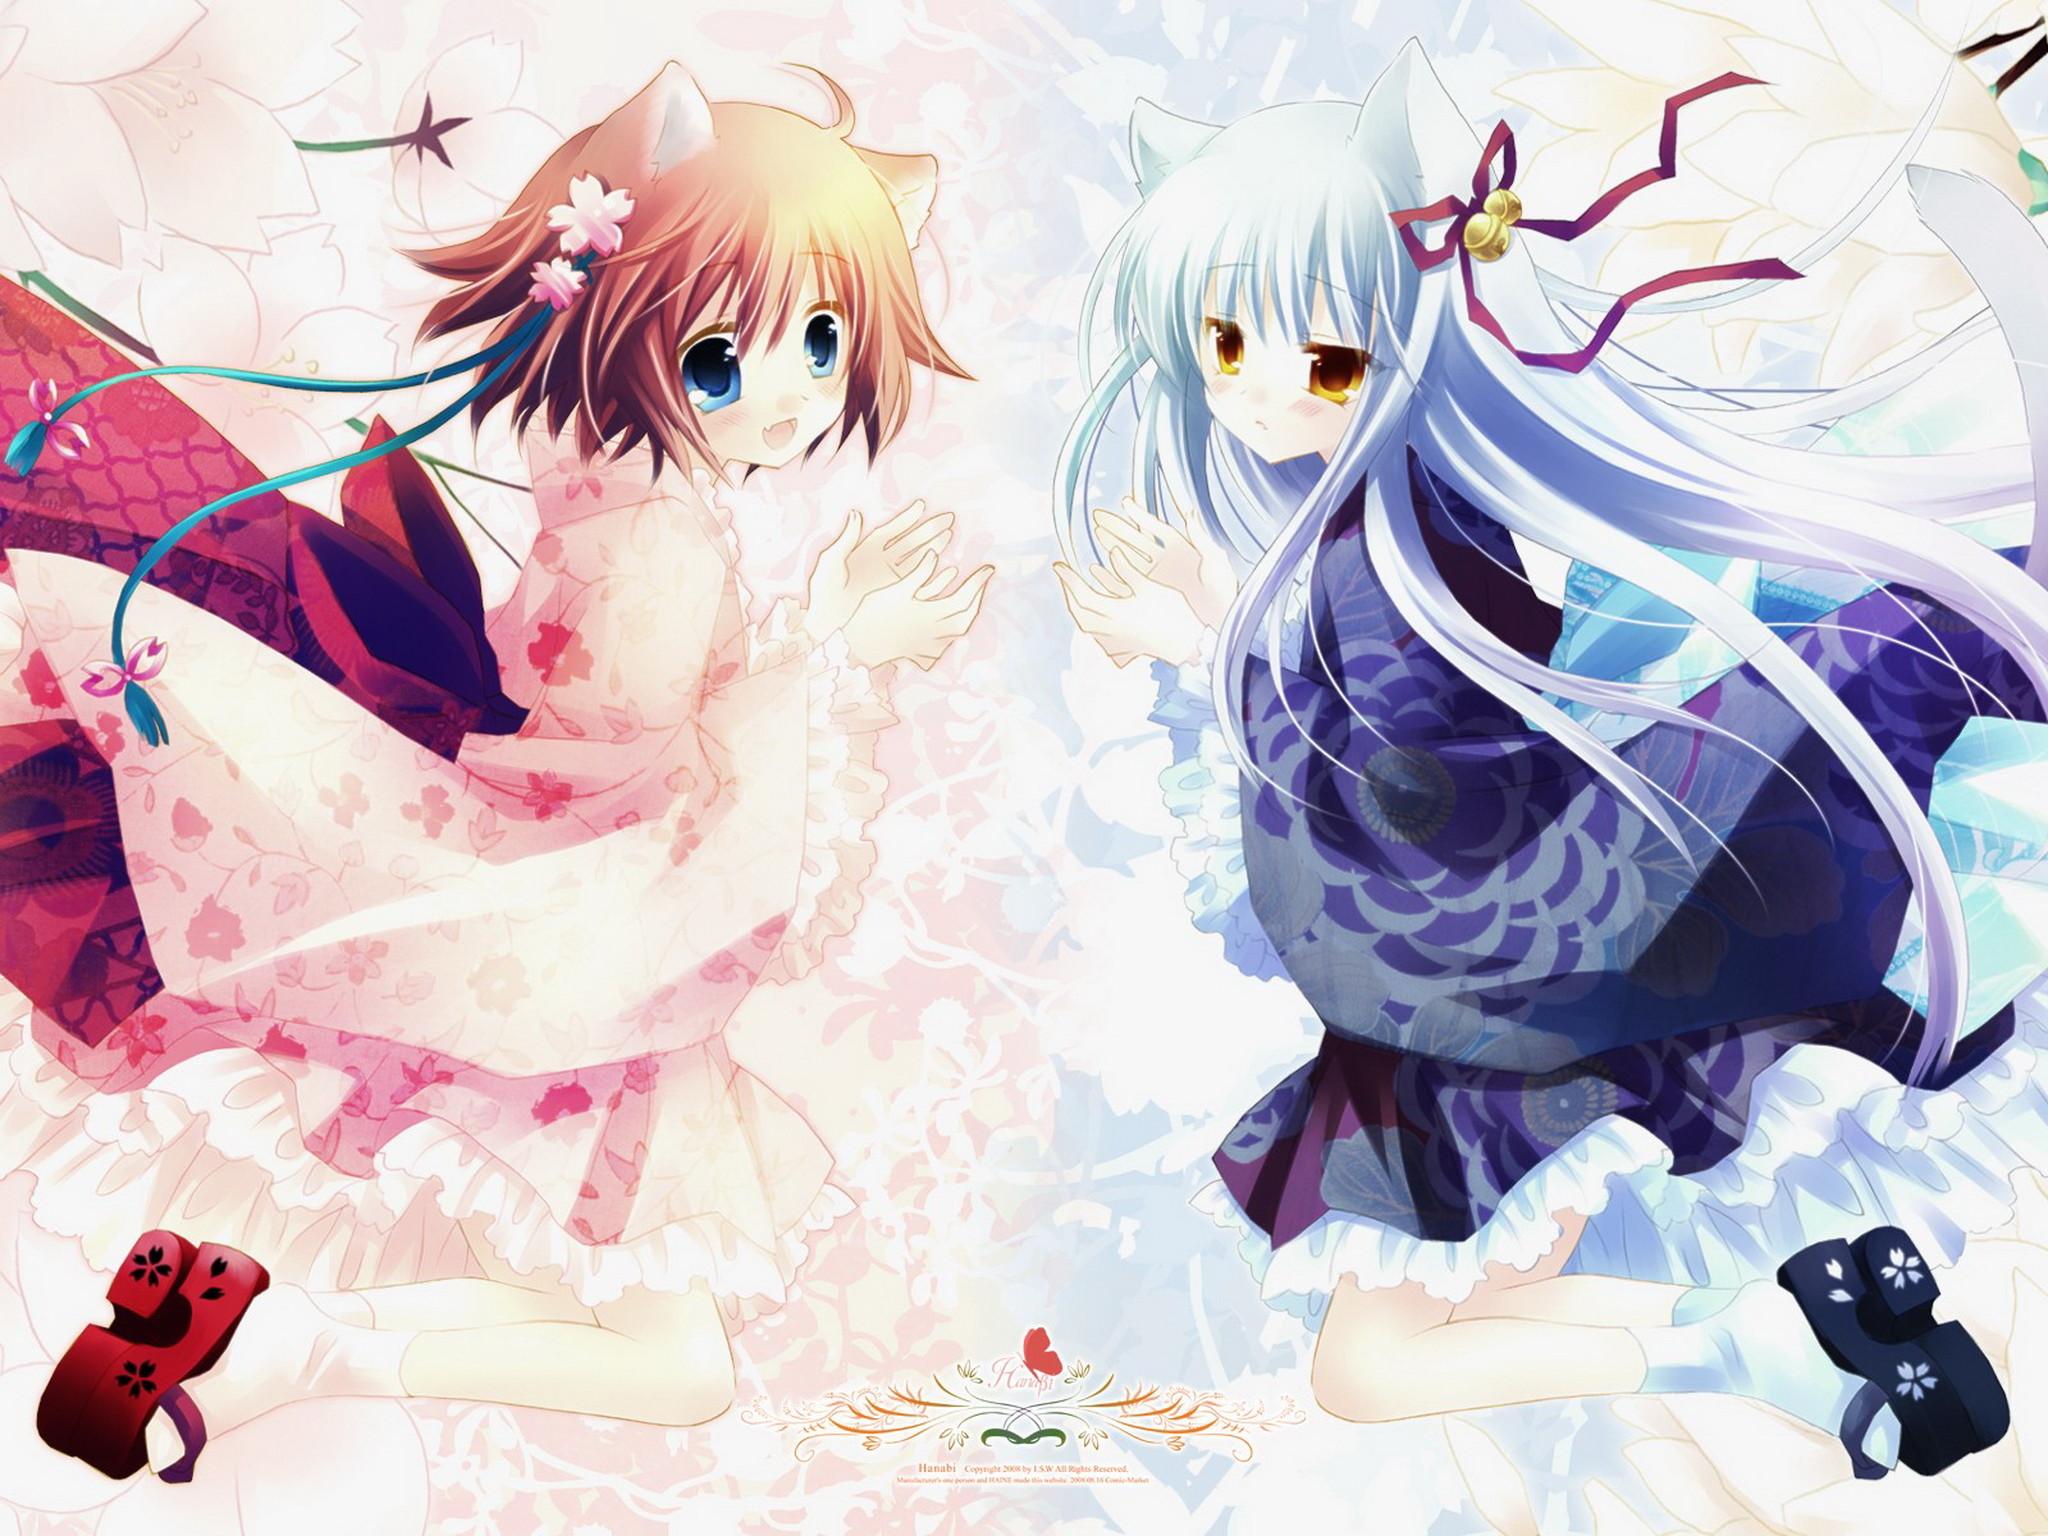 Manga Art   Japanese Anime Art Wallpaper, iPad